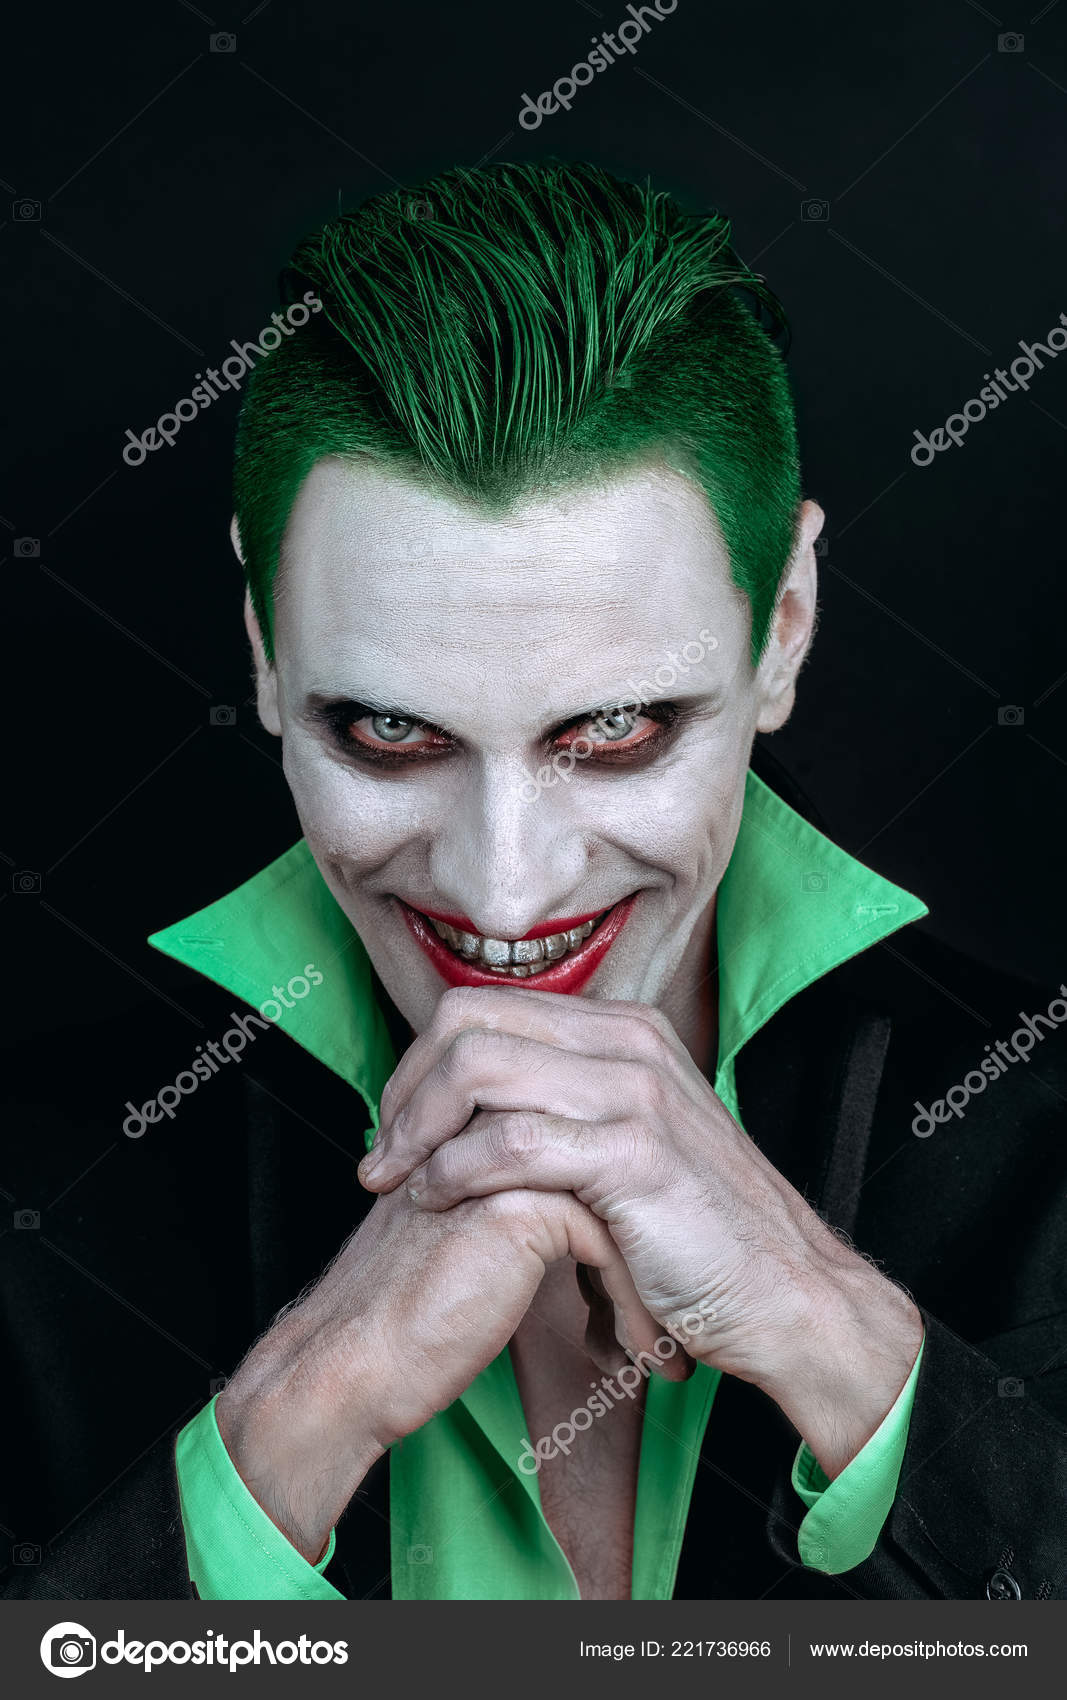 Portrait Of A Joker Makeup For Halloween Crazy Image Of A